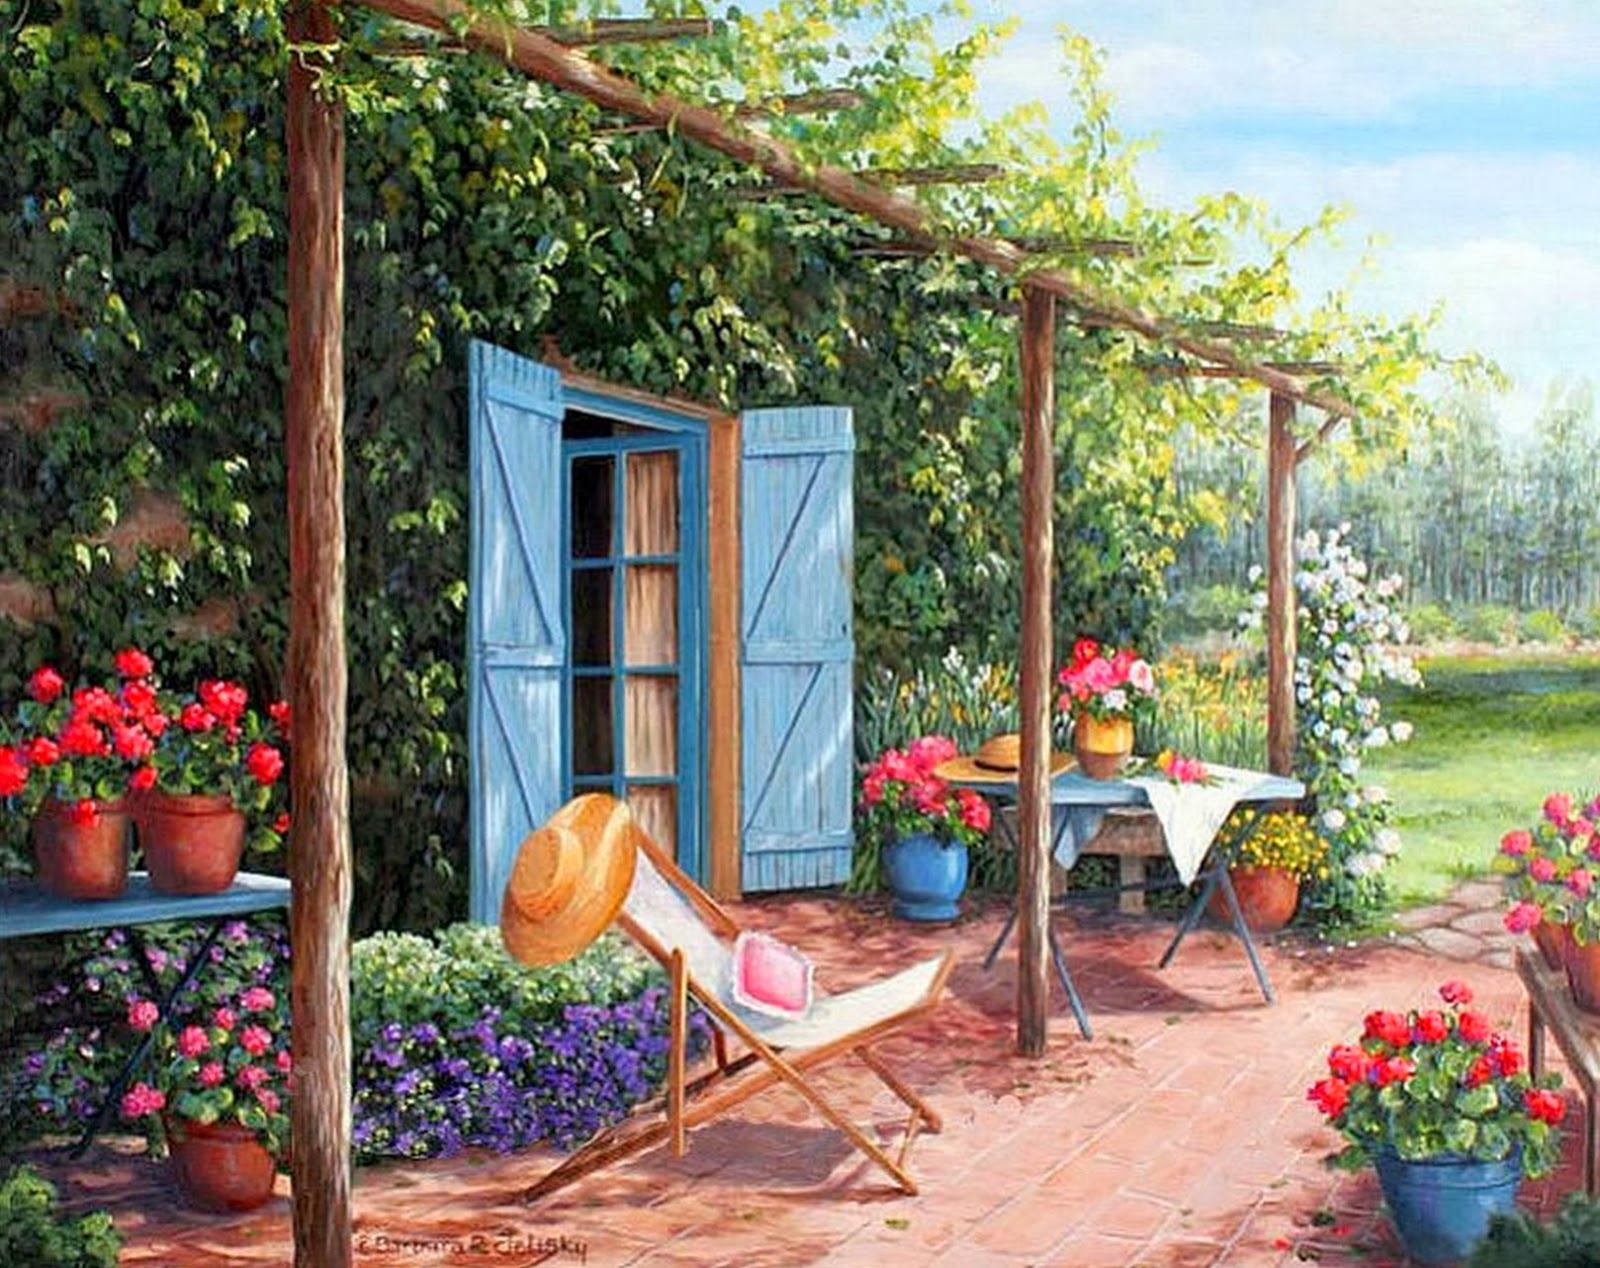 Pintura moderna y fotograf a art stica paisaje con for Jardin 7 colores bernal